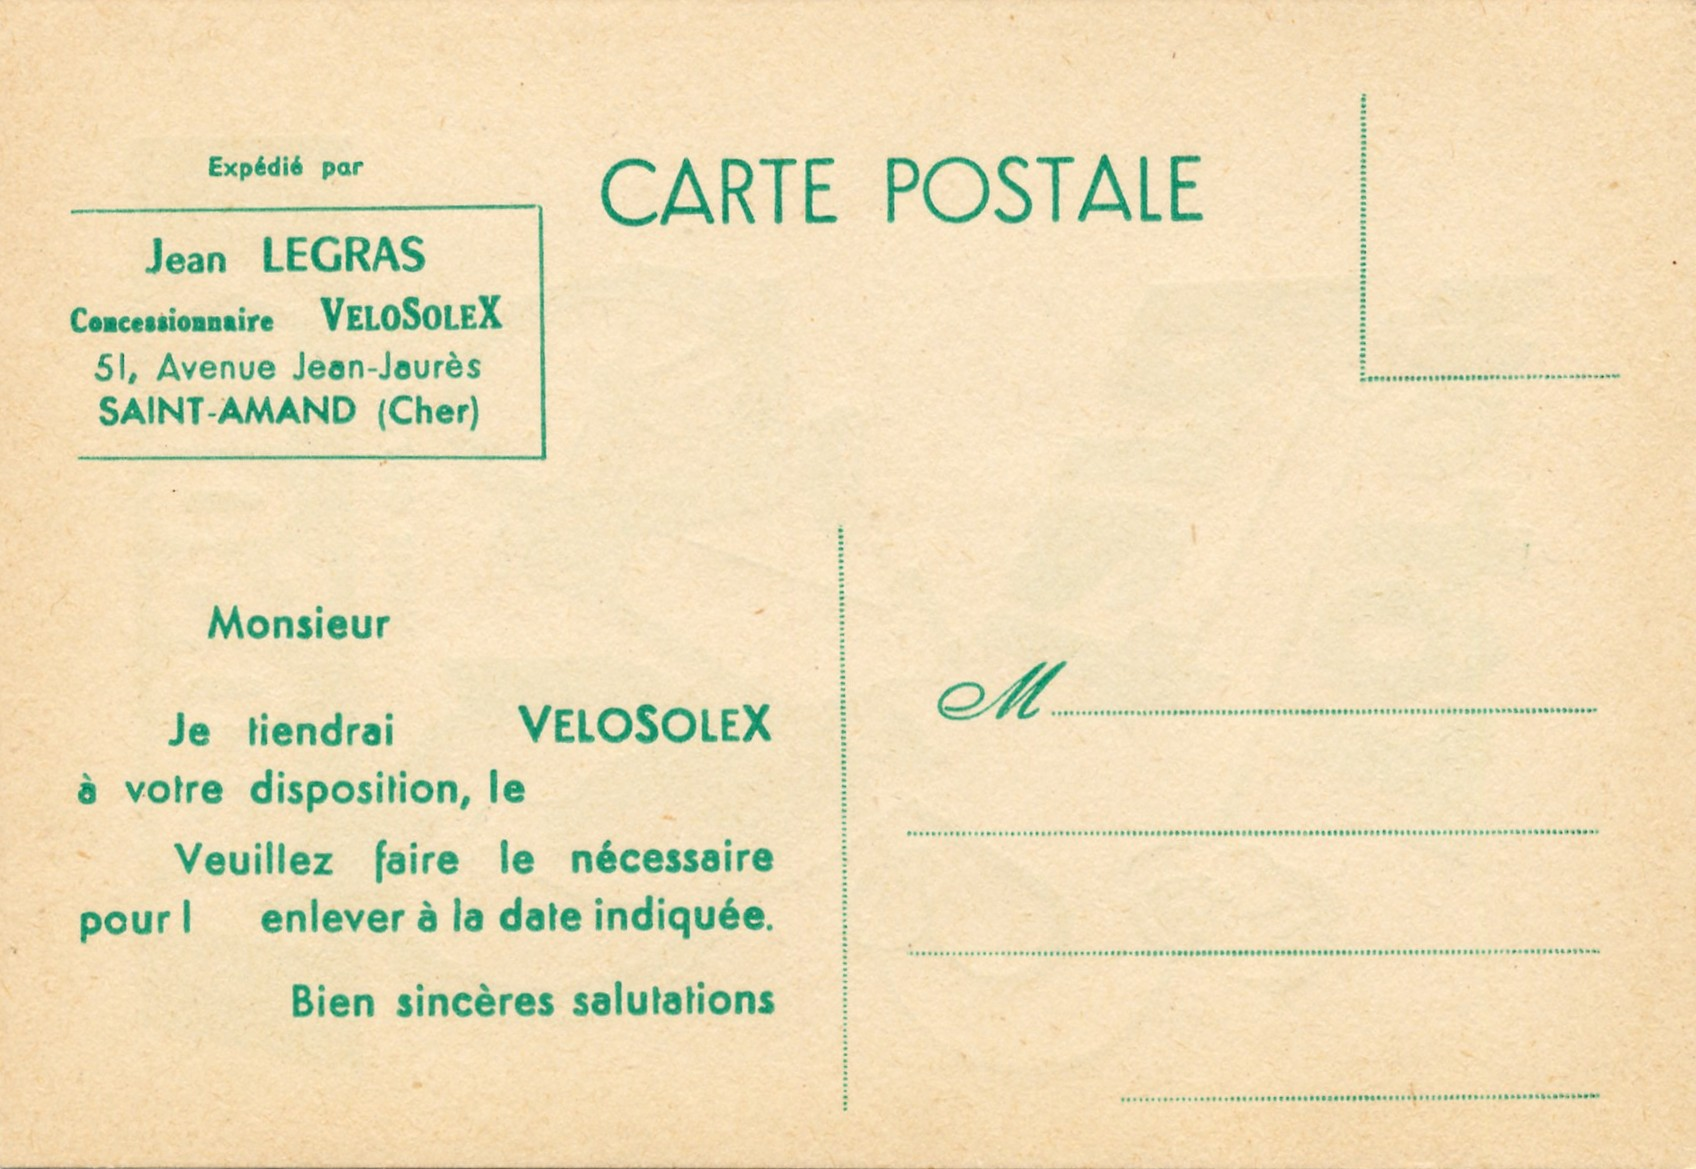 carte-postale-1-verso.jpg